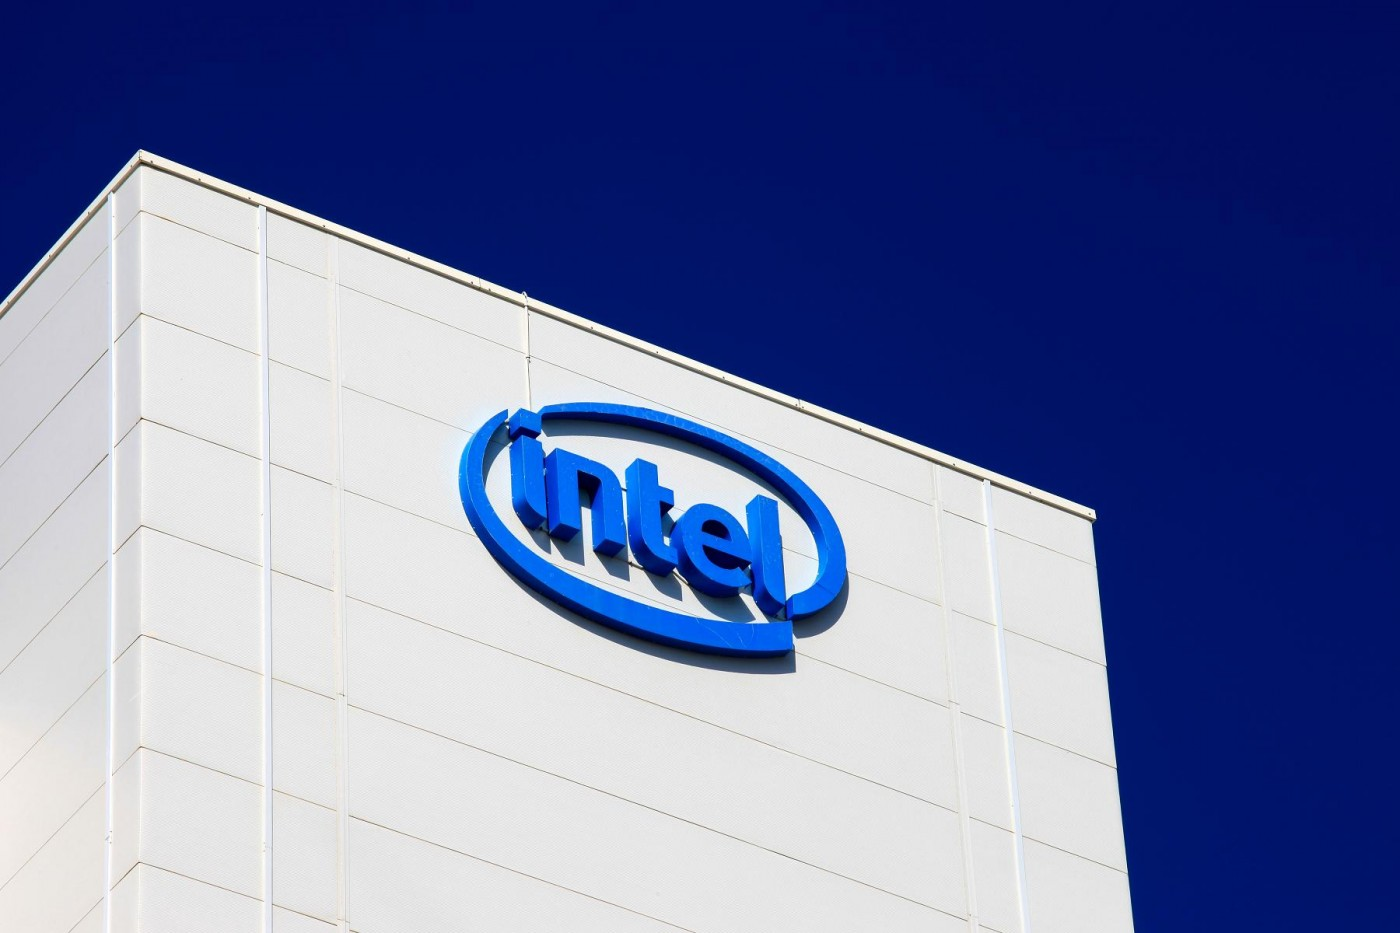 lntel處理器風暴擴大,蘋果坦承iPhone、iPad、Mac受影響,其他科技大廠紛紛自救